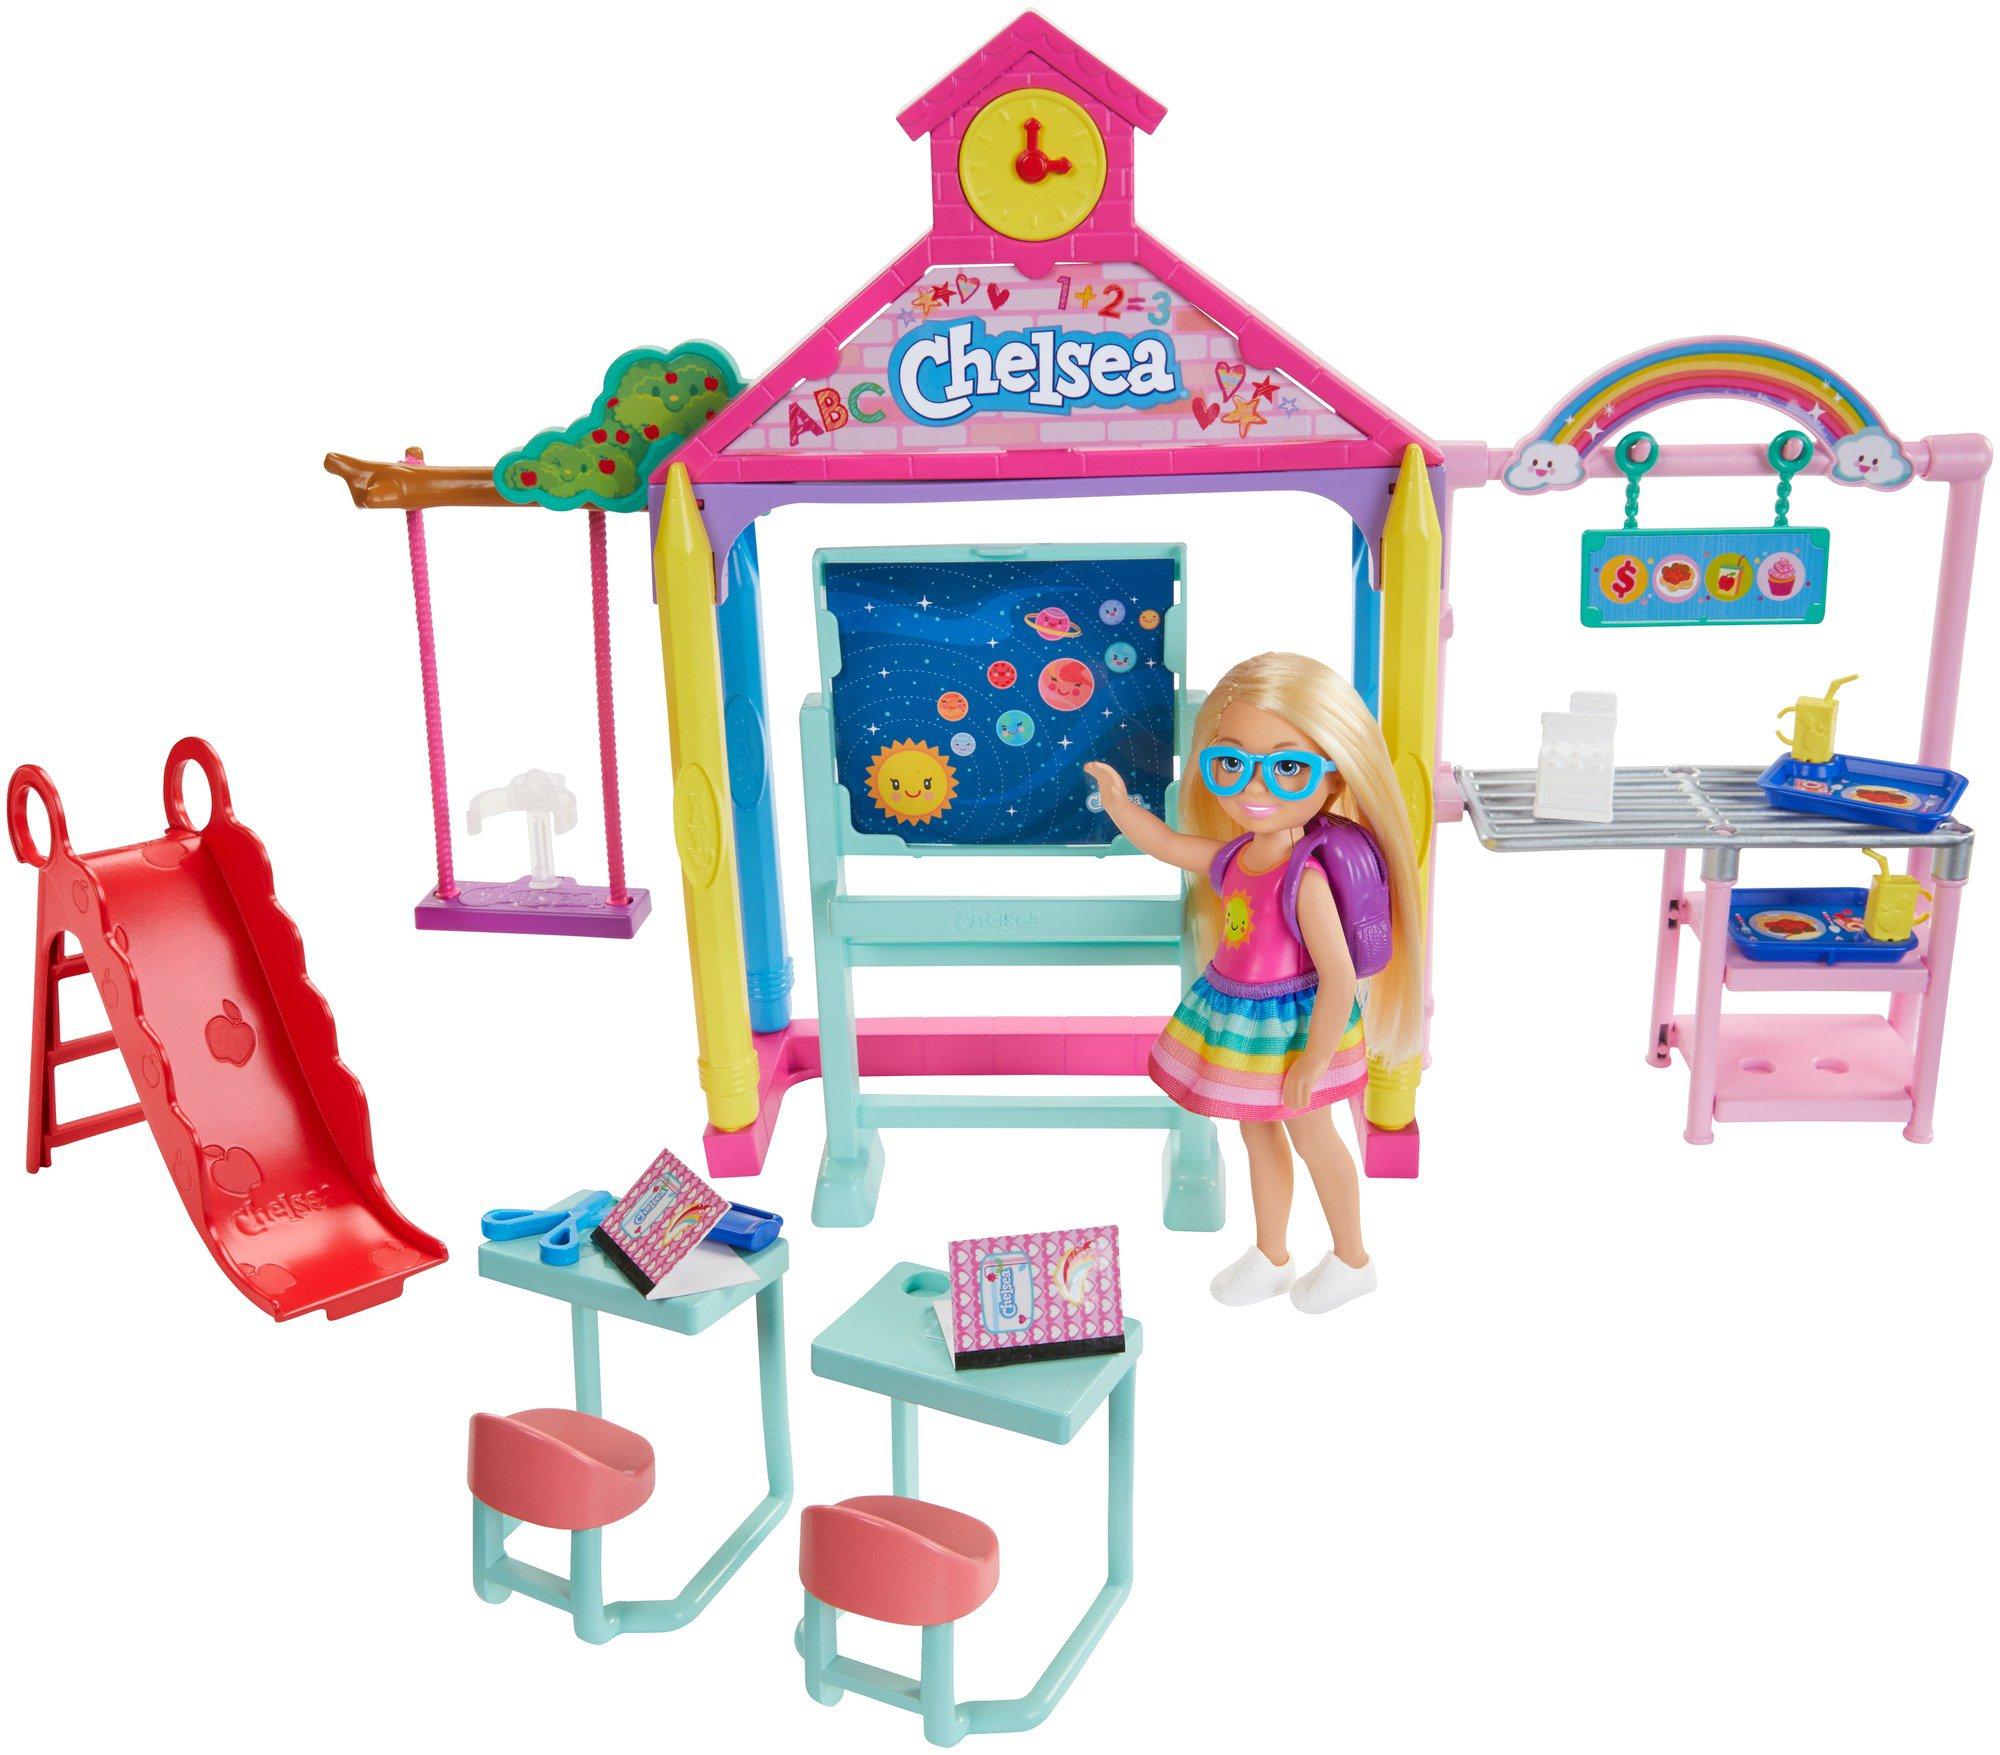 Barbie Club Chelsea School Playset Shop Playsets At H E B